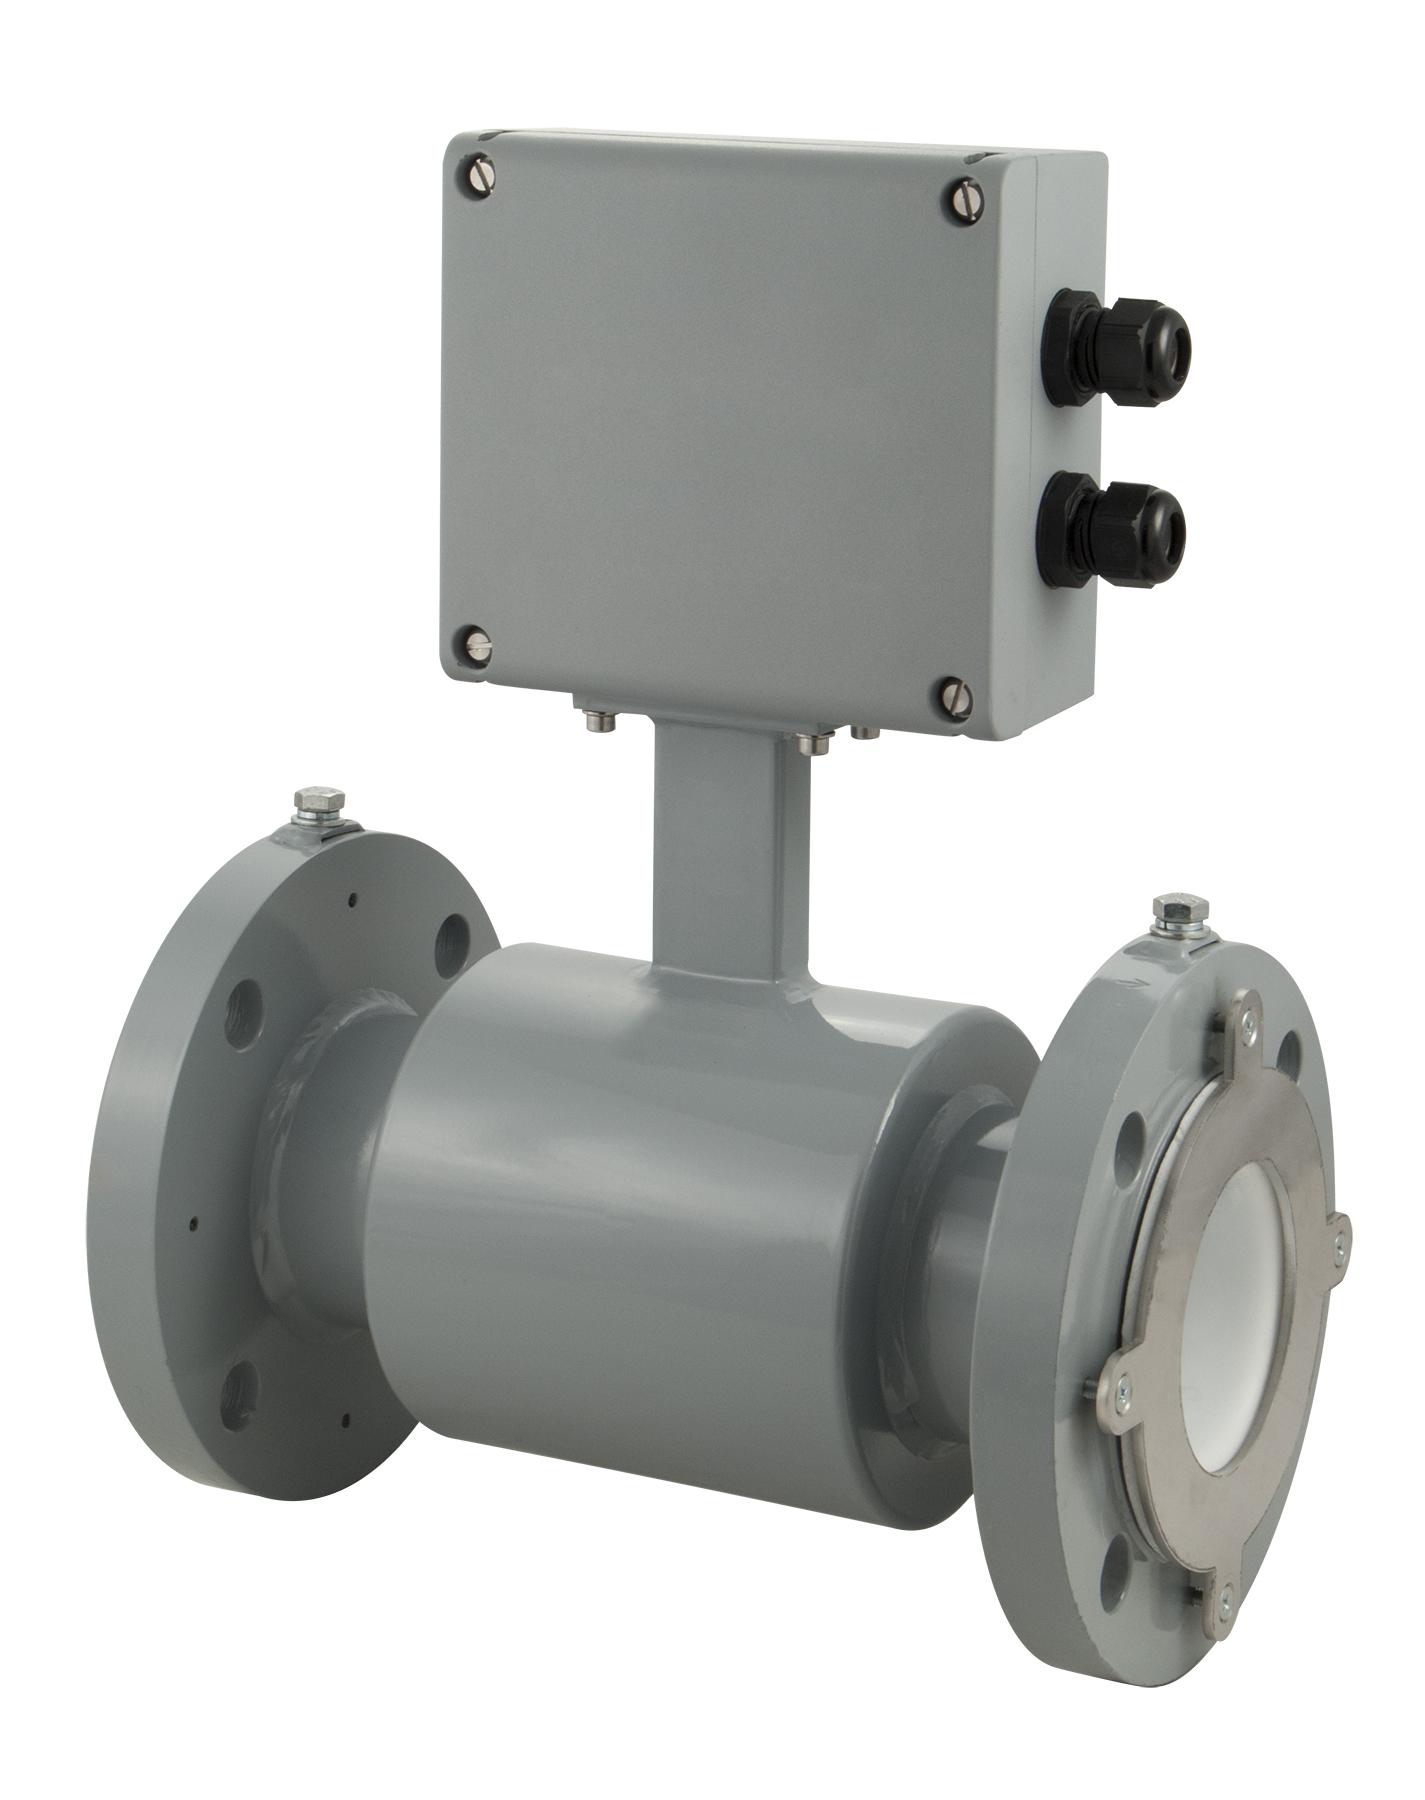 M7600 Electromagnetic Flow Meter